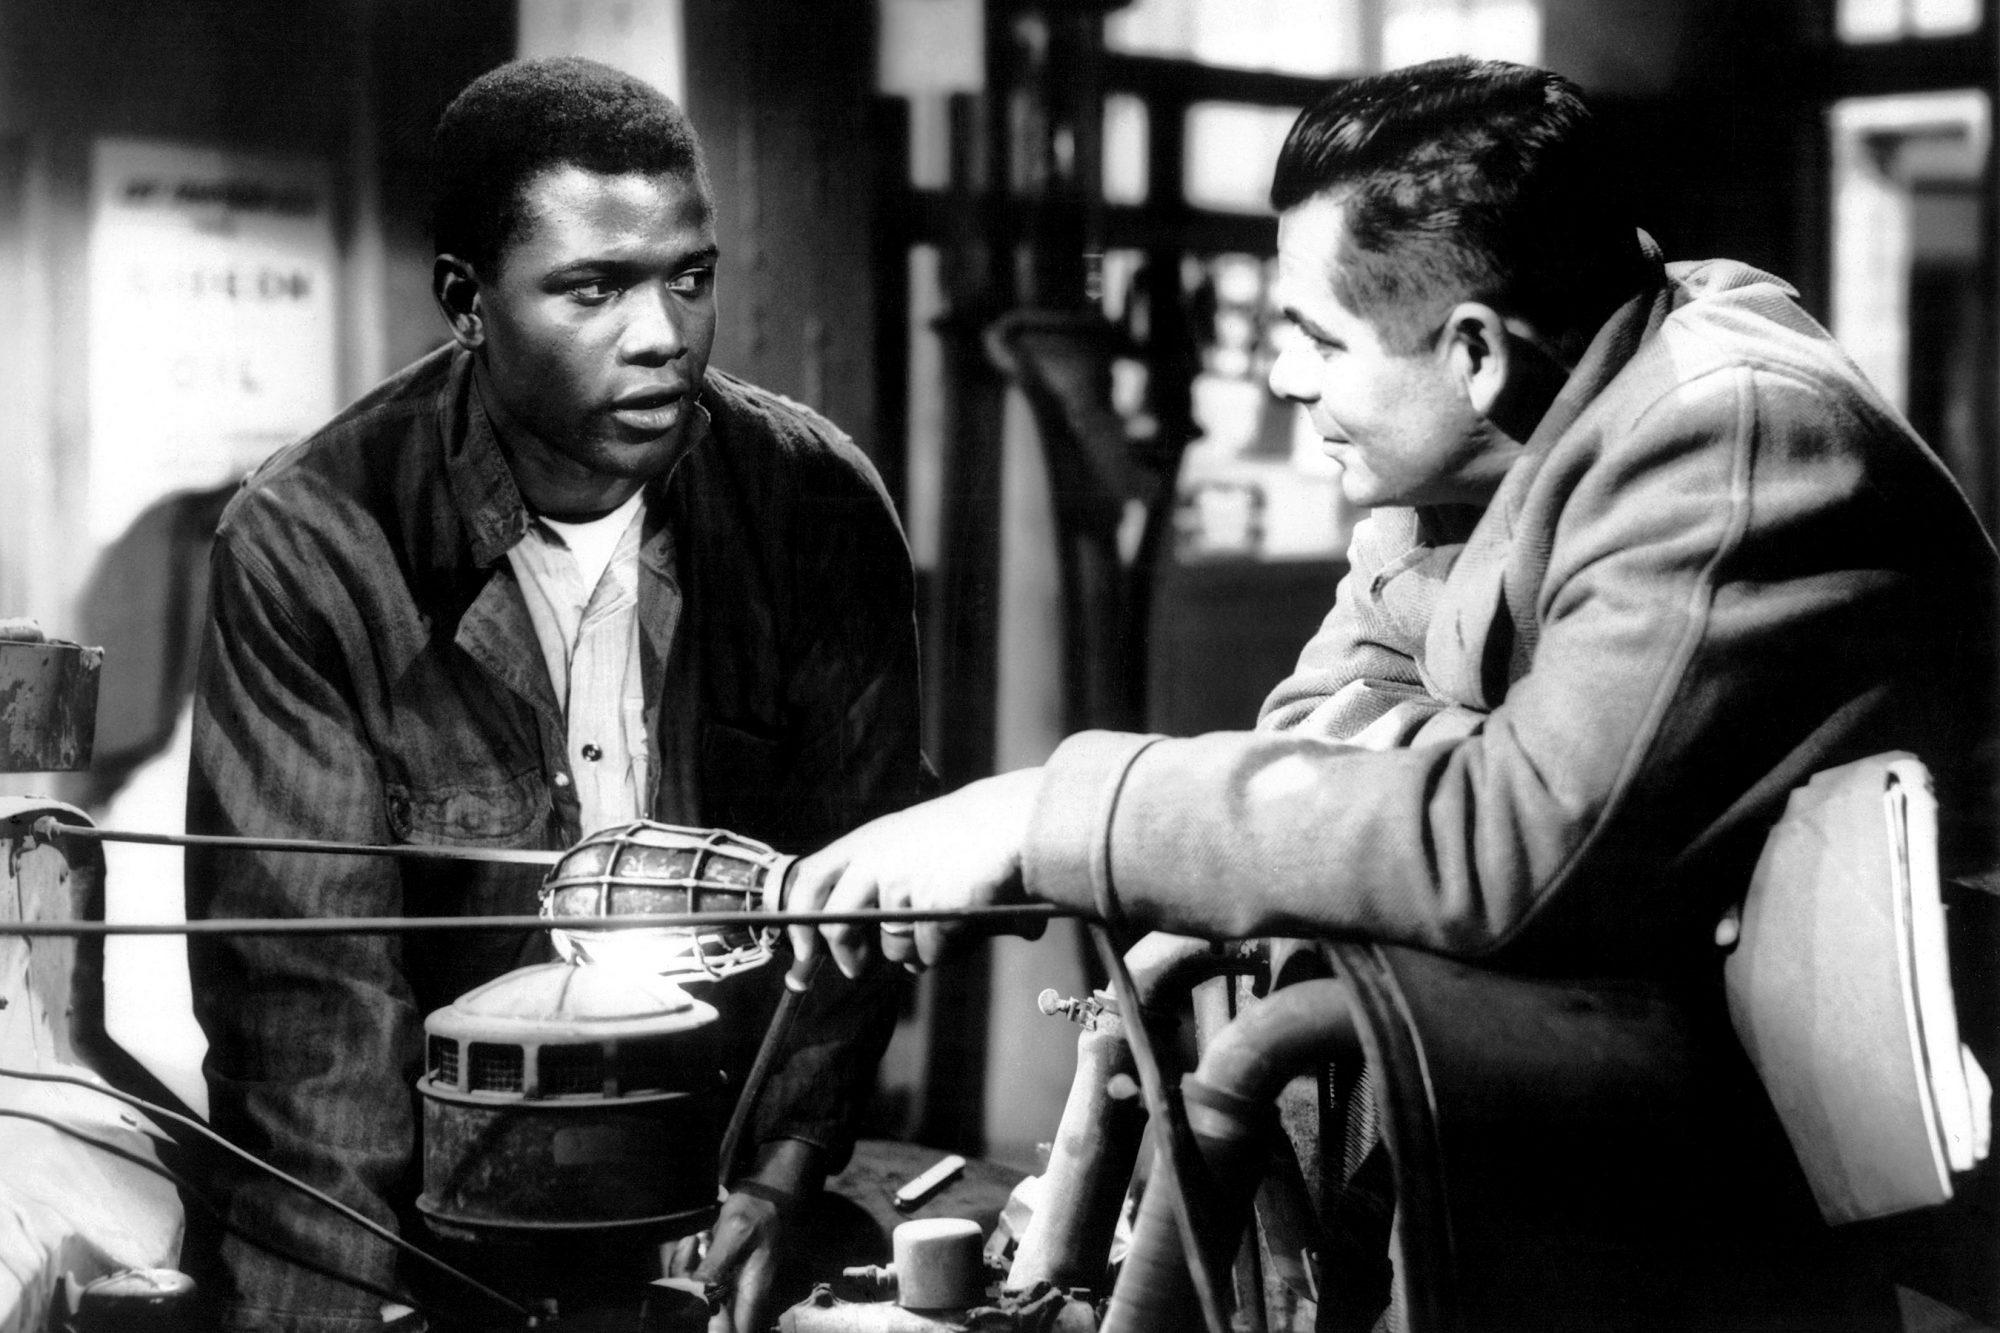 THE BLACKBOARD JUNGLE, Sidney Poitier, Glenn Ford, 1955